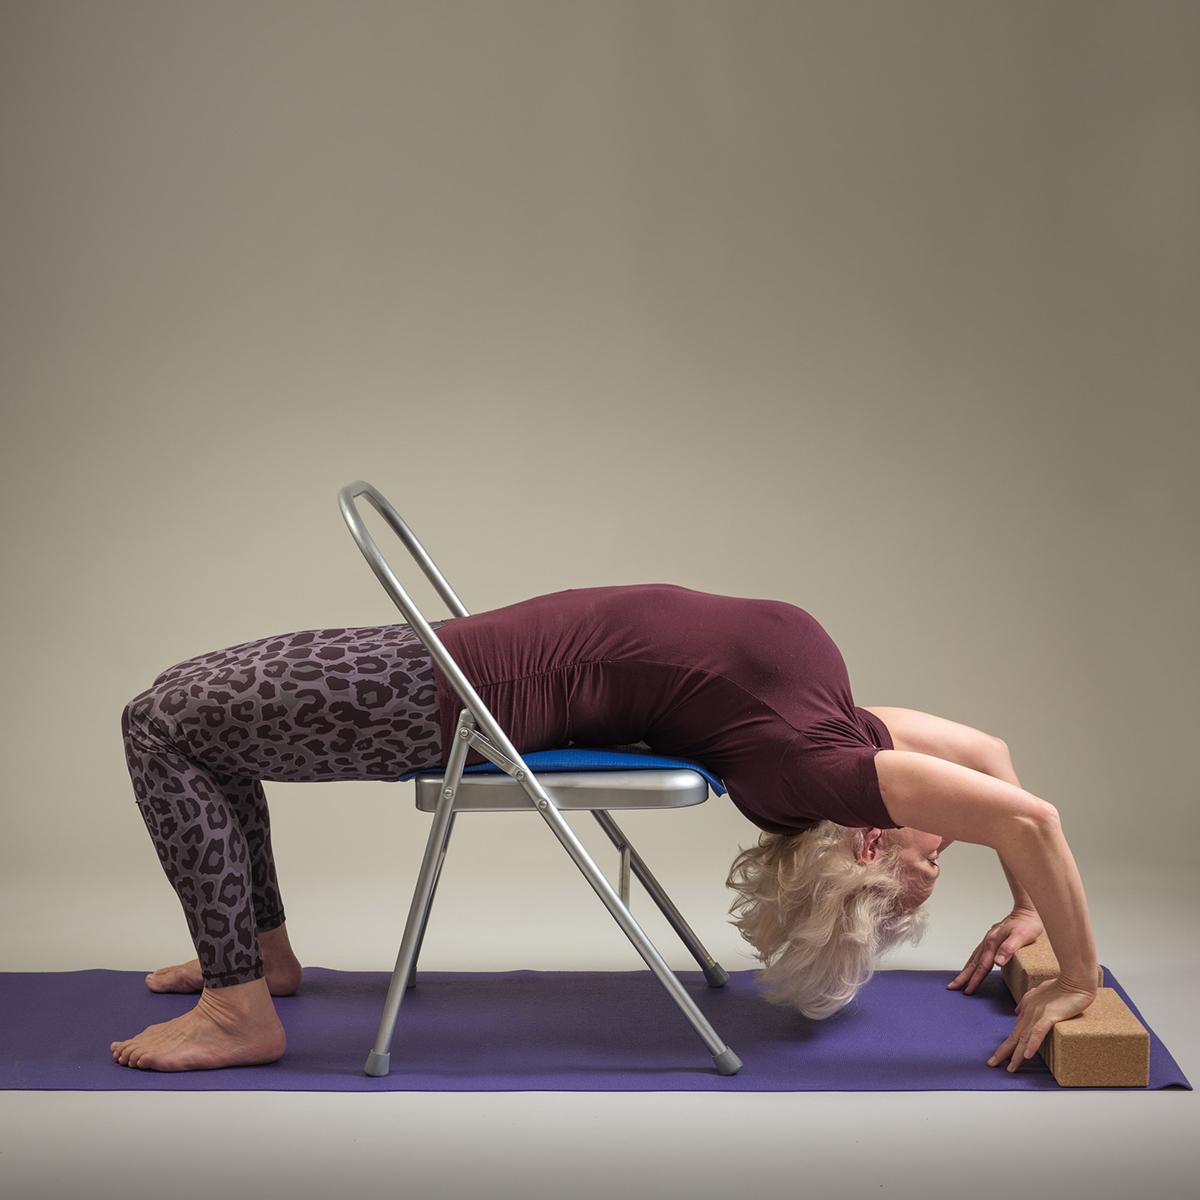 "yoga-chaise-upward-face-personnel-pose ""width ="" 1200 ""height ="" 1200 ""srcset ="" https://www.yogamatters.com/blog/wp-content/uploads/2019/03/ yoga-chaise-upward-staff-pose.jpg 1200w, https://www.yogamatters.com/blog/wp-content/uploads/2019/03/yoga-chair-upward-face-staff-pose-300x300 .jpg 300w, https://www.yogamatters.com/blog/wp-content/uploads/2019/03/yoga-chair-upward-face-staff-pose-1024x1024.jpg 1024w, https: //www.yogamatters .com / blog / wp-content / uploads / 2019/03 / yoga-chaise-upward-staff-pose-60x60.jpg 60w, https://www.yogamatters.com/blog/wp-content/uploads/ 2019/03 / yoga-chaise-upward-staff-pose-32x32.jpg 32w, https://www.yogamatters.com/blog/wp-content/uploads/2019/03/yoga-chair-upward-face -staff-pose-50x50.jpg 50w, https://www.yogamatters.com/blog/wp-content/uploads/2019/03/yoga-chair-upward-face-staff-pose-64x64.jpg 64w, https : //www.yogamatters.com/blog/wp-content/uploads/2019/03/yoga-chair-upward-face-staff-pose-96x96.jpg 96w, https://www.yogamatters.com/blog/ wp-content /uploads/2019/03/yoga- chair-upward-face-staff-pose-128x128.jpg 128w ""tailles ="" (largeur maximale: 1200px) 100vw, 1200px ""/></p></noscript><p><span data-contrast="